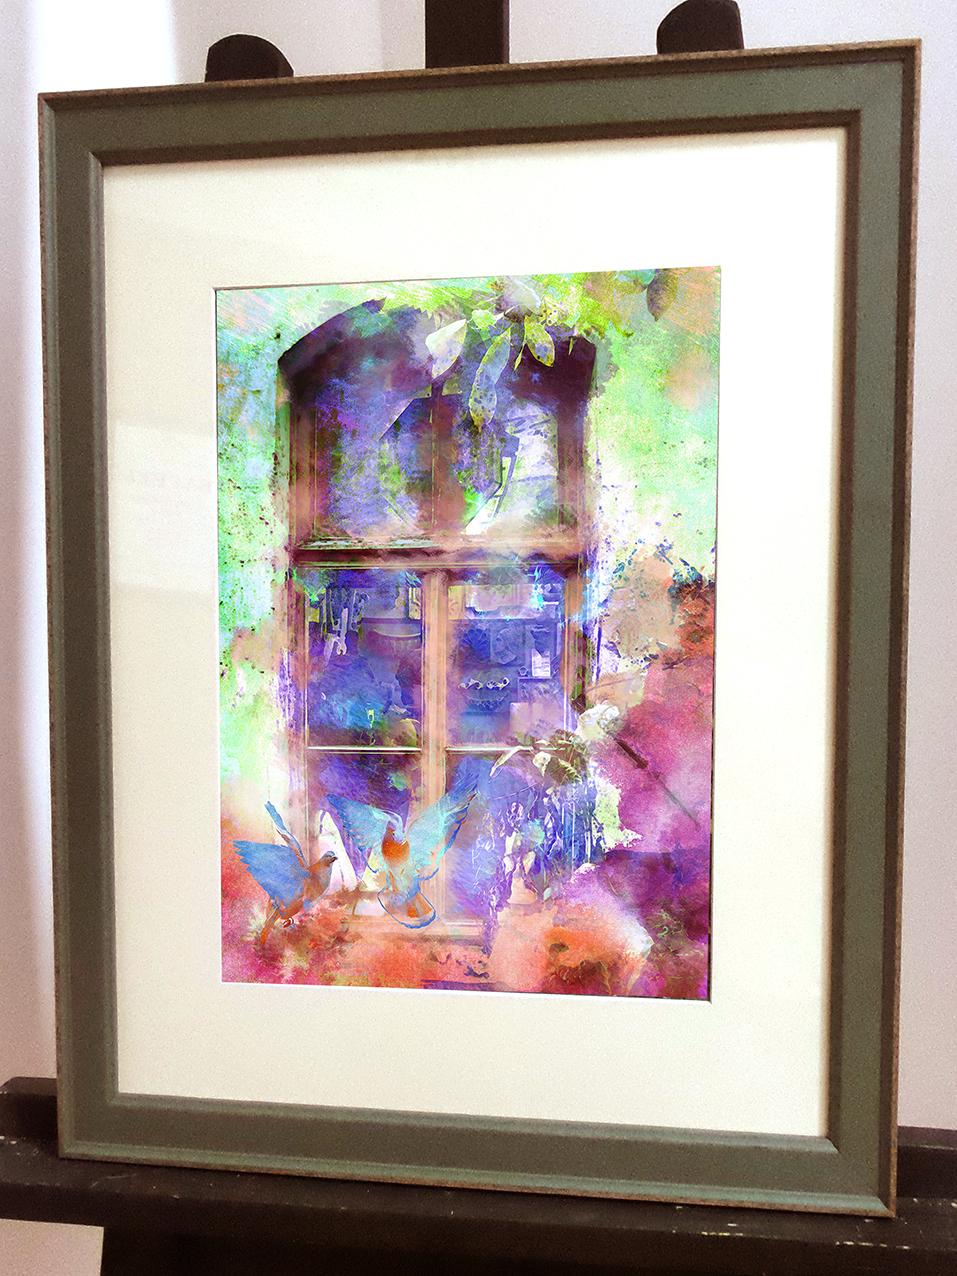 окно академии худажеств в багете